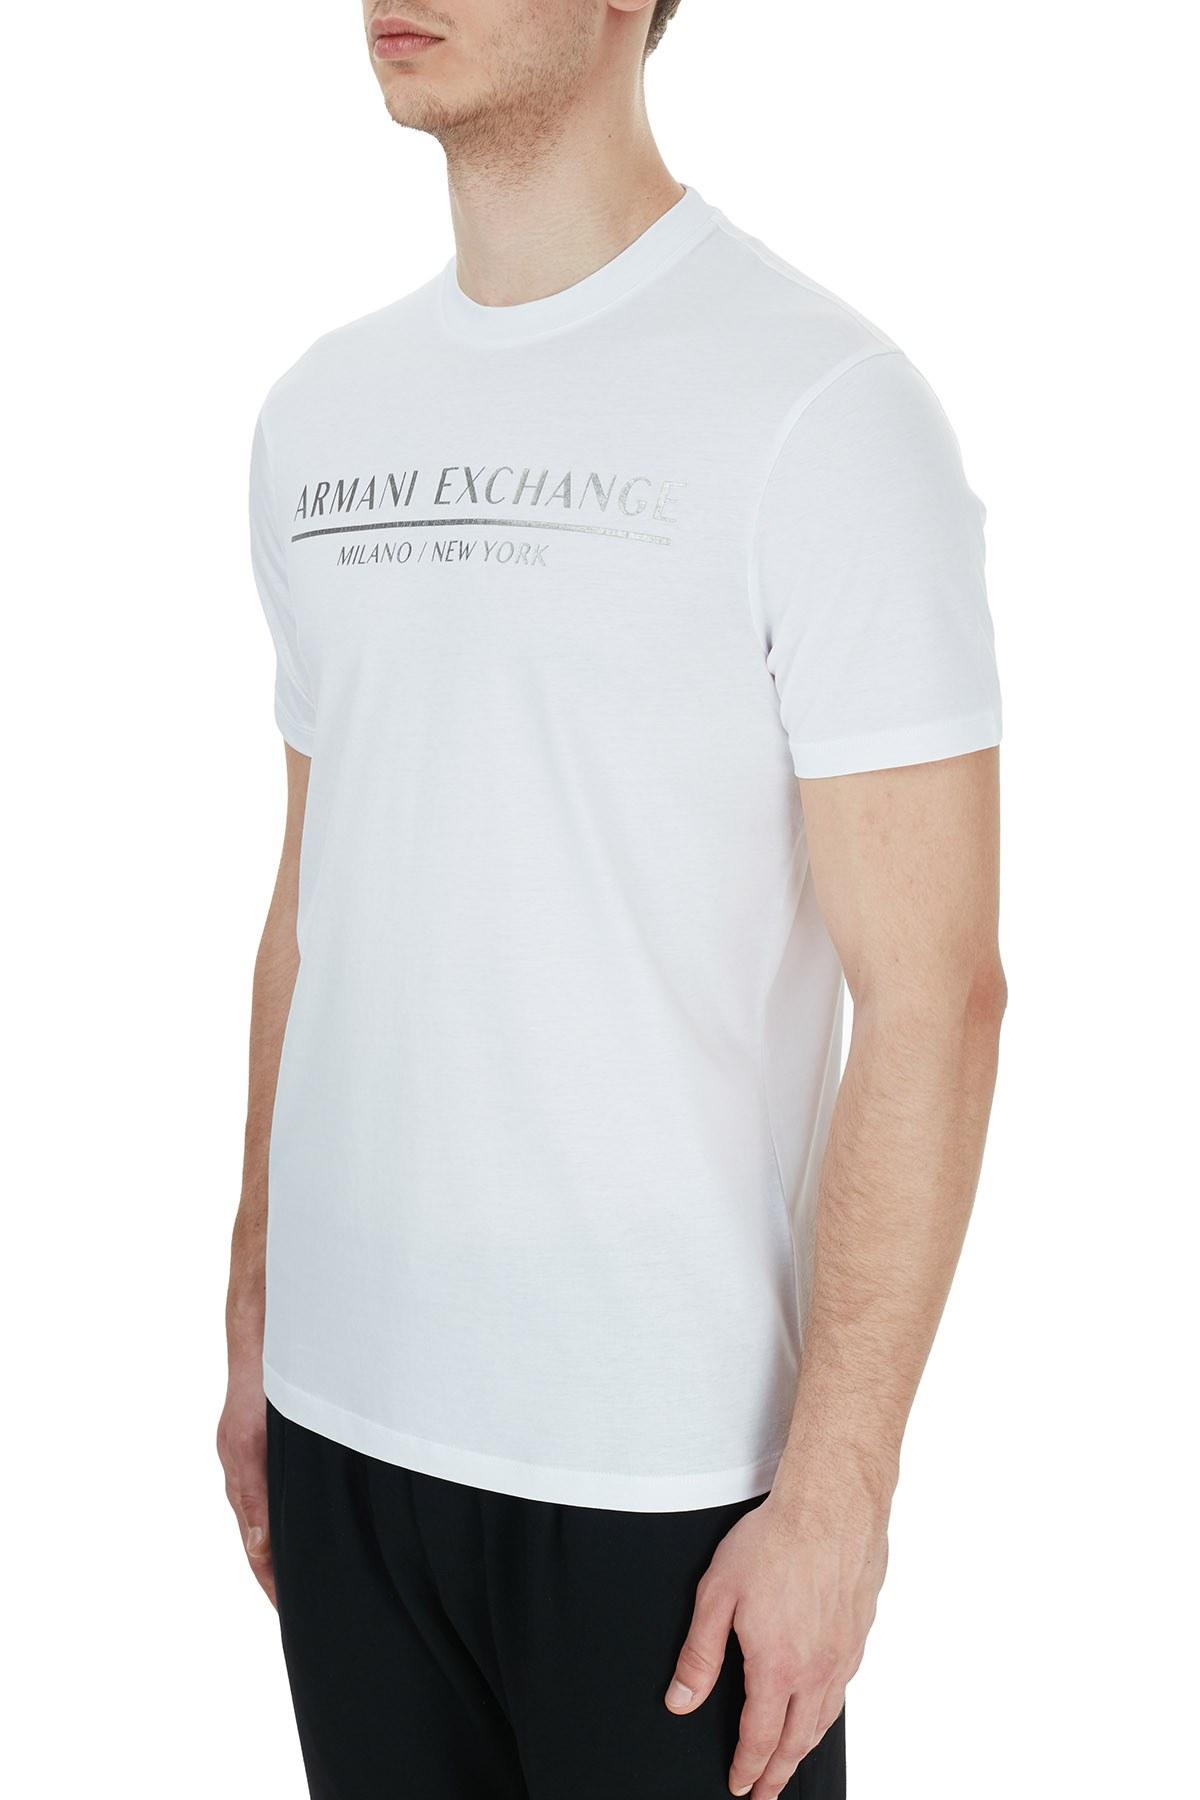 Armani Exchange % 100 Pamuklu Baskılı Bisiklet Yaka Erkek T Shirt 6HZTLI ZJ9AZ 1100 BEYAZ